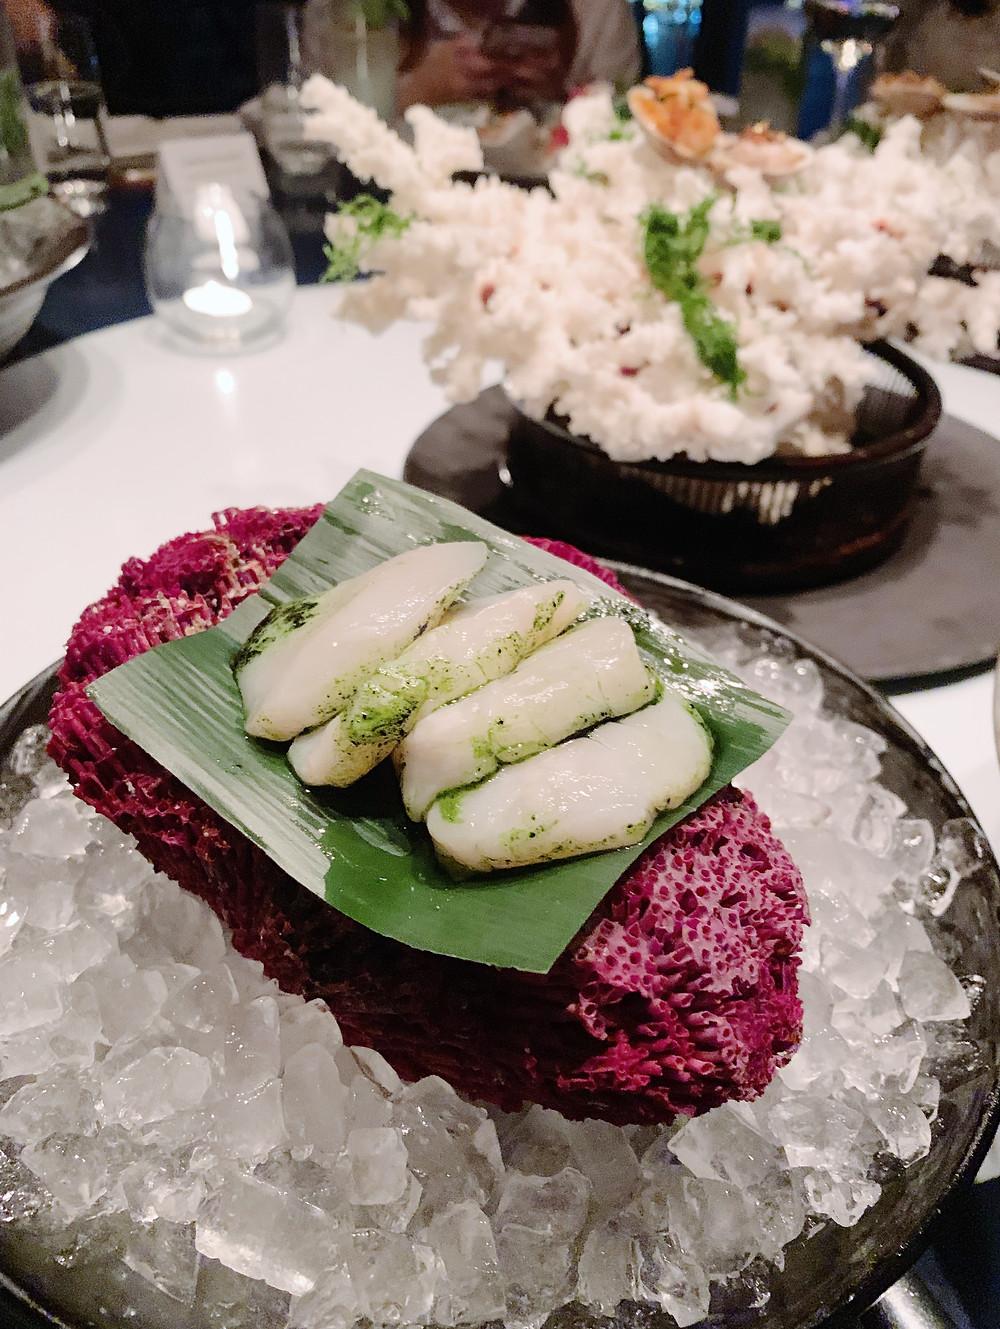 Food at Aqua restaurant in Hong Kong